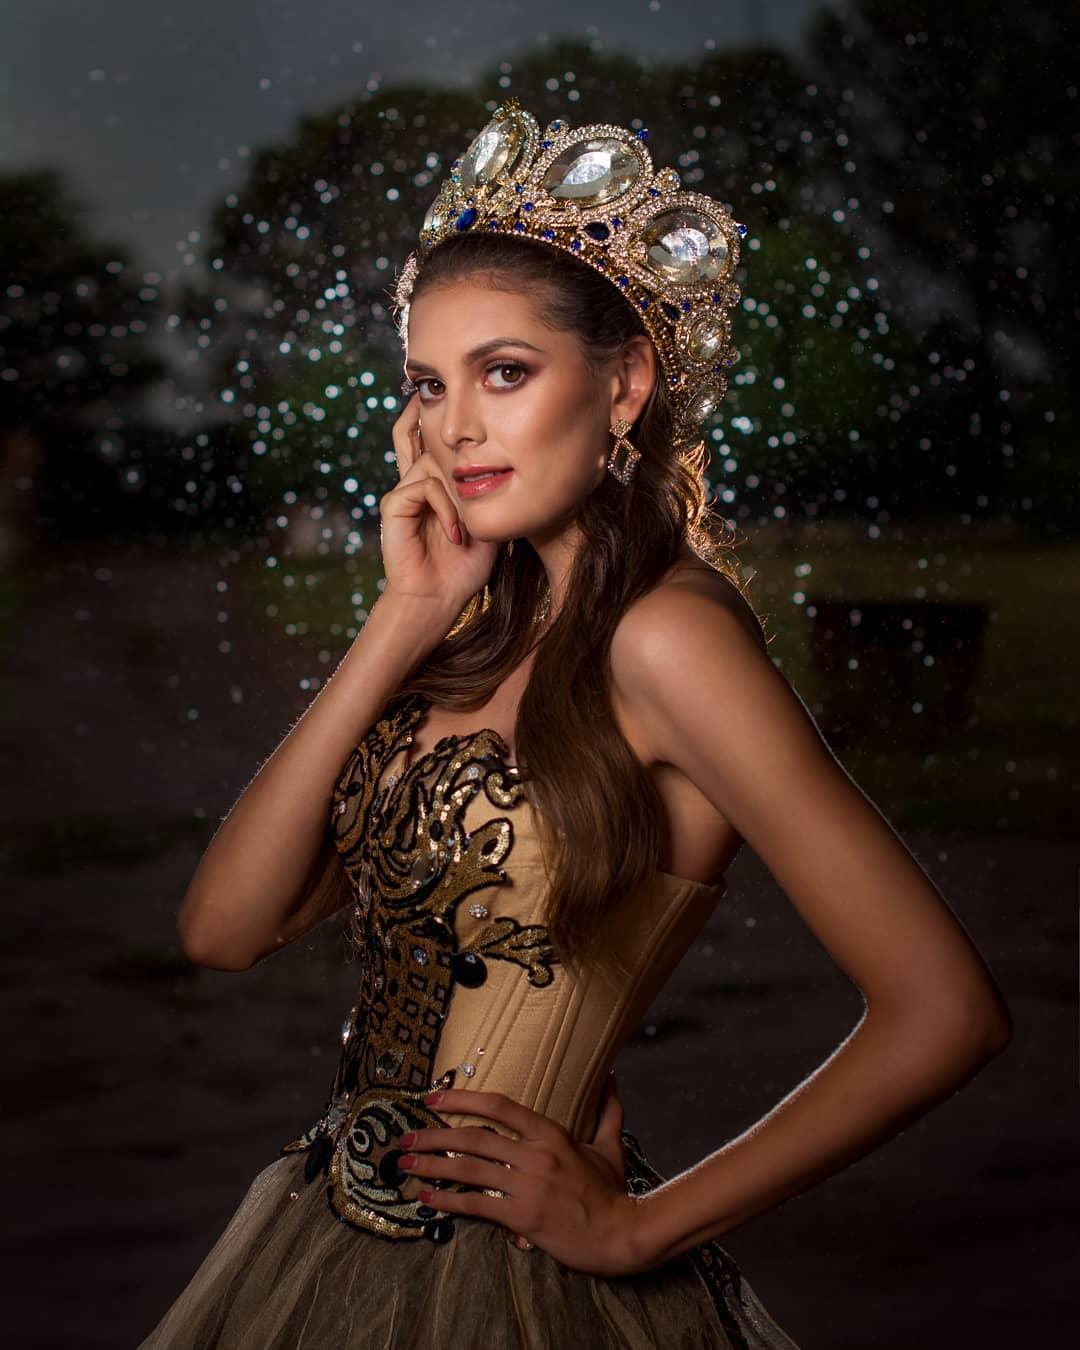 andrea saenz, miss continentes unidos 2018. - Página 2 36866610